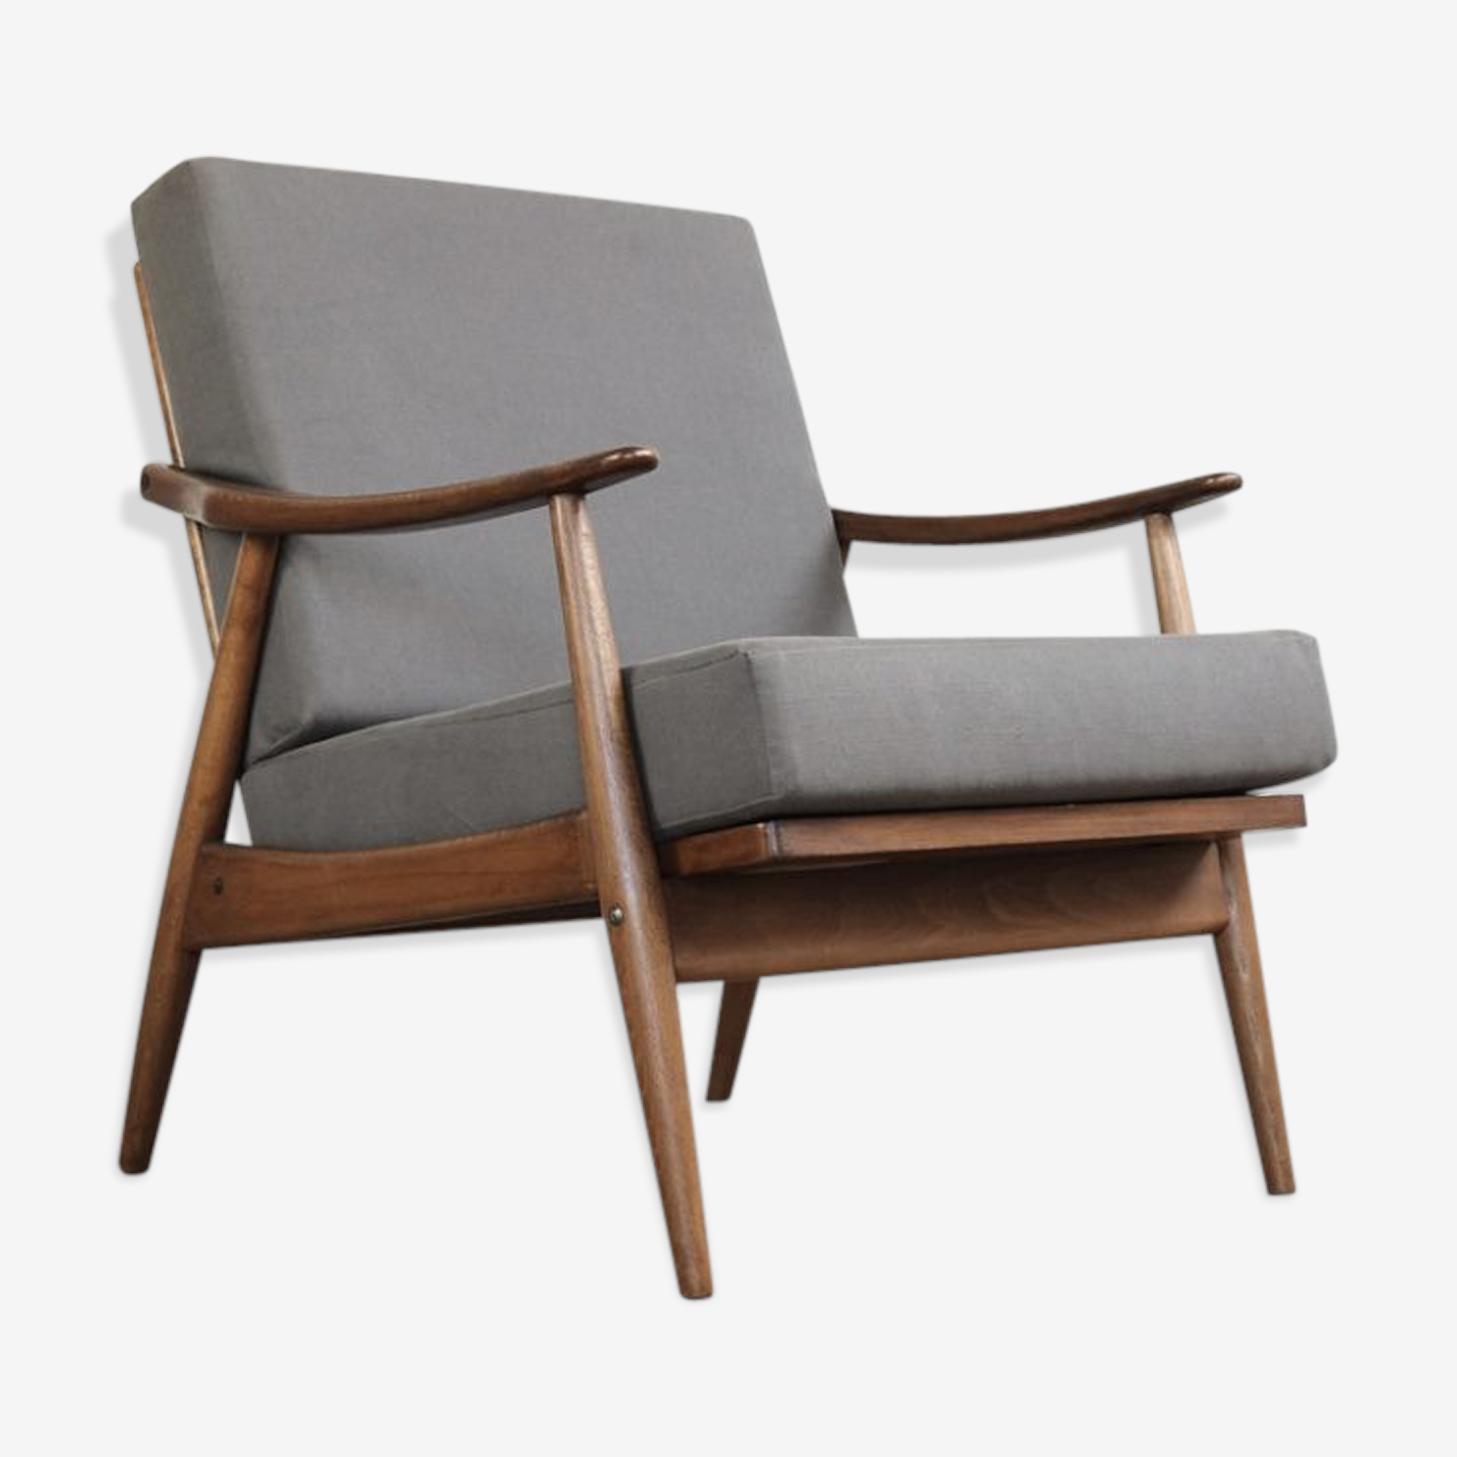 Danish Chair in gray fabric beech